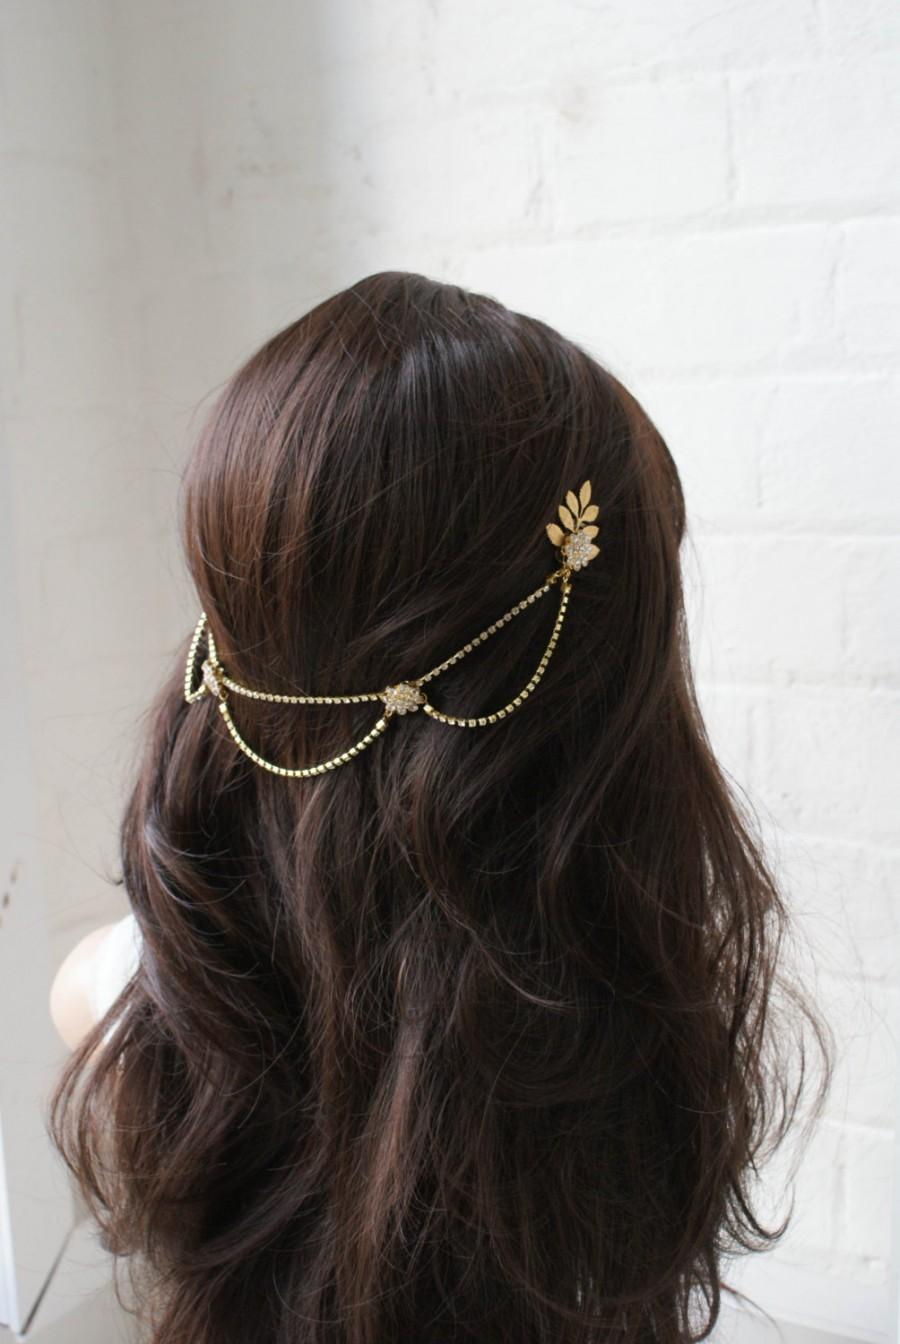 Mariage - Bridal Headpiece - 1920s wedding Headpiece - Bohemian Bridal Accessory- Gold-tone headpiece with drapes